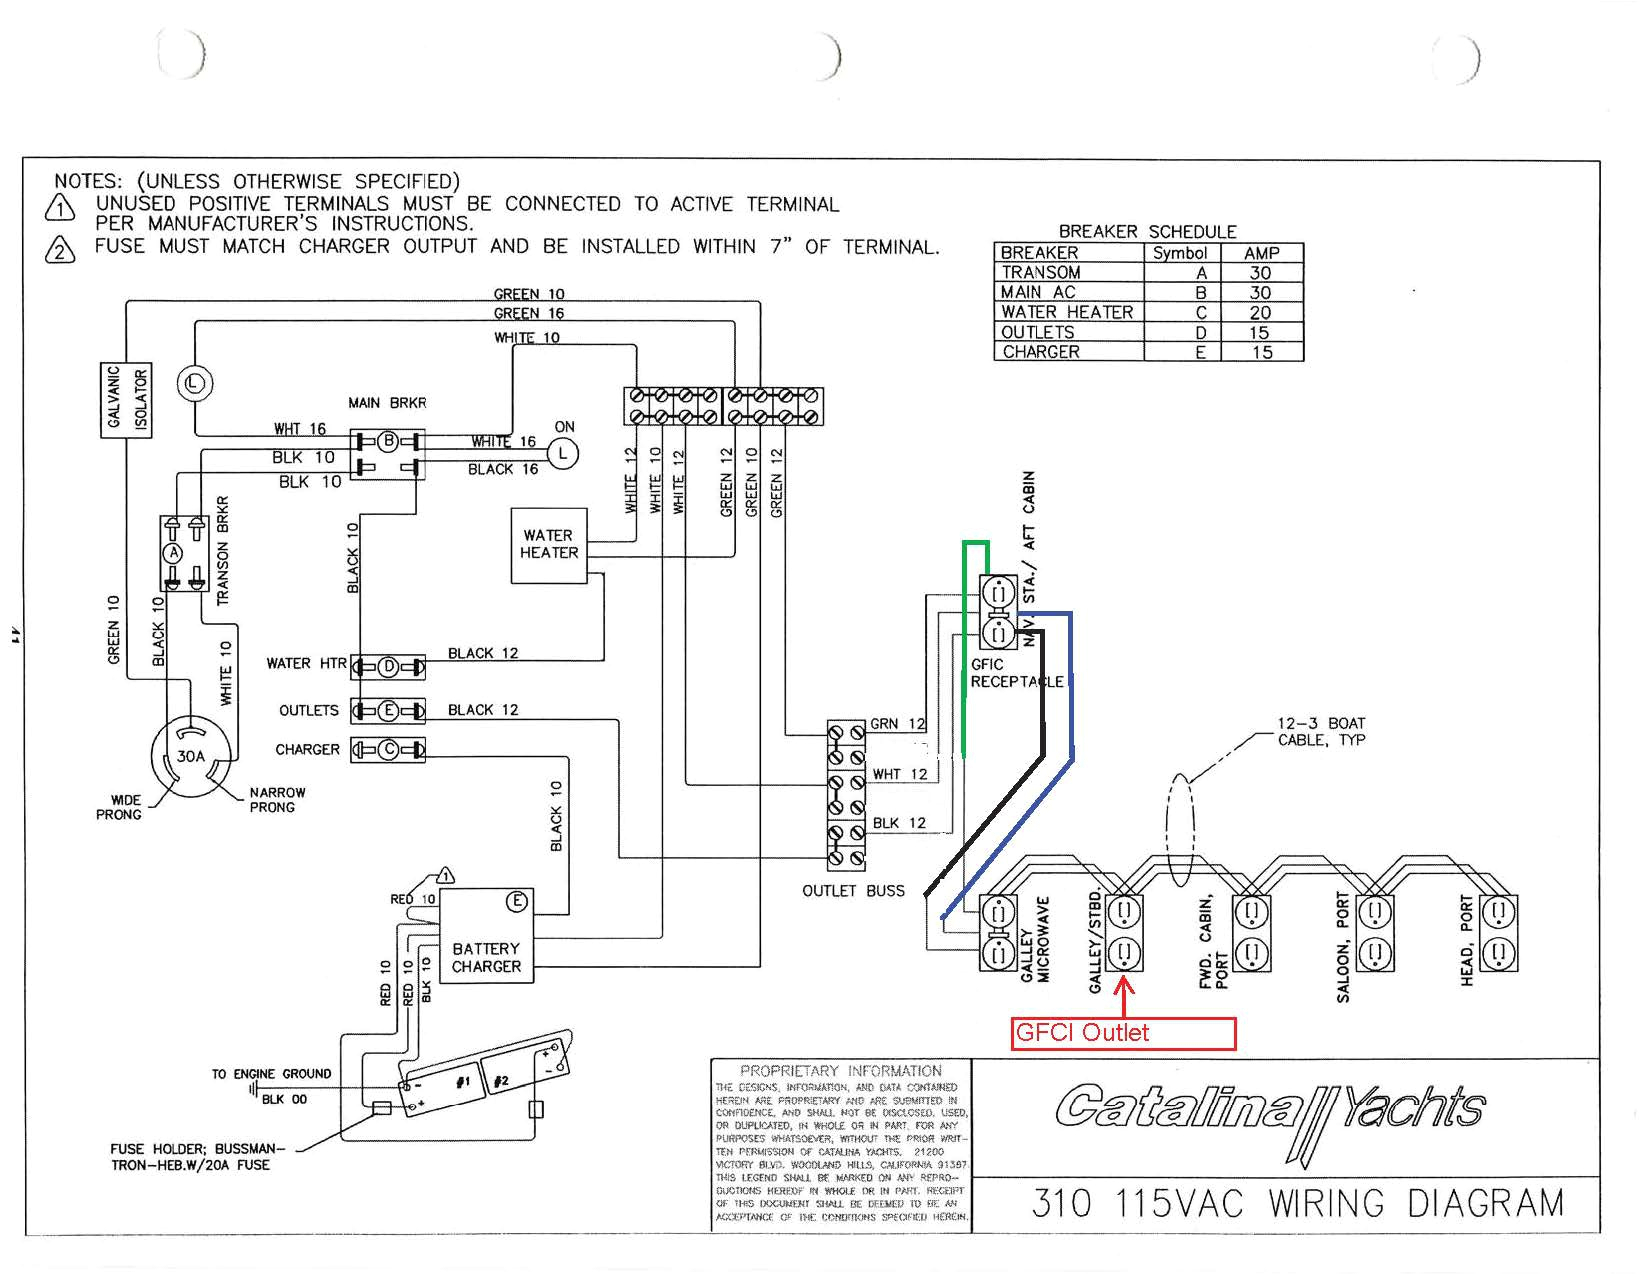 pldn73i wiring diagram for wiring diagram centrewiring maxon diagram lift 080552650 wiring diagram centremaxon 280252 wiring